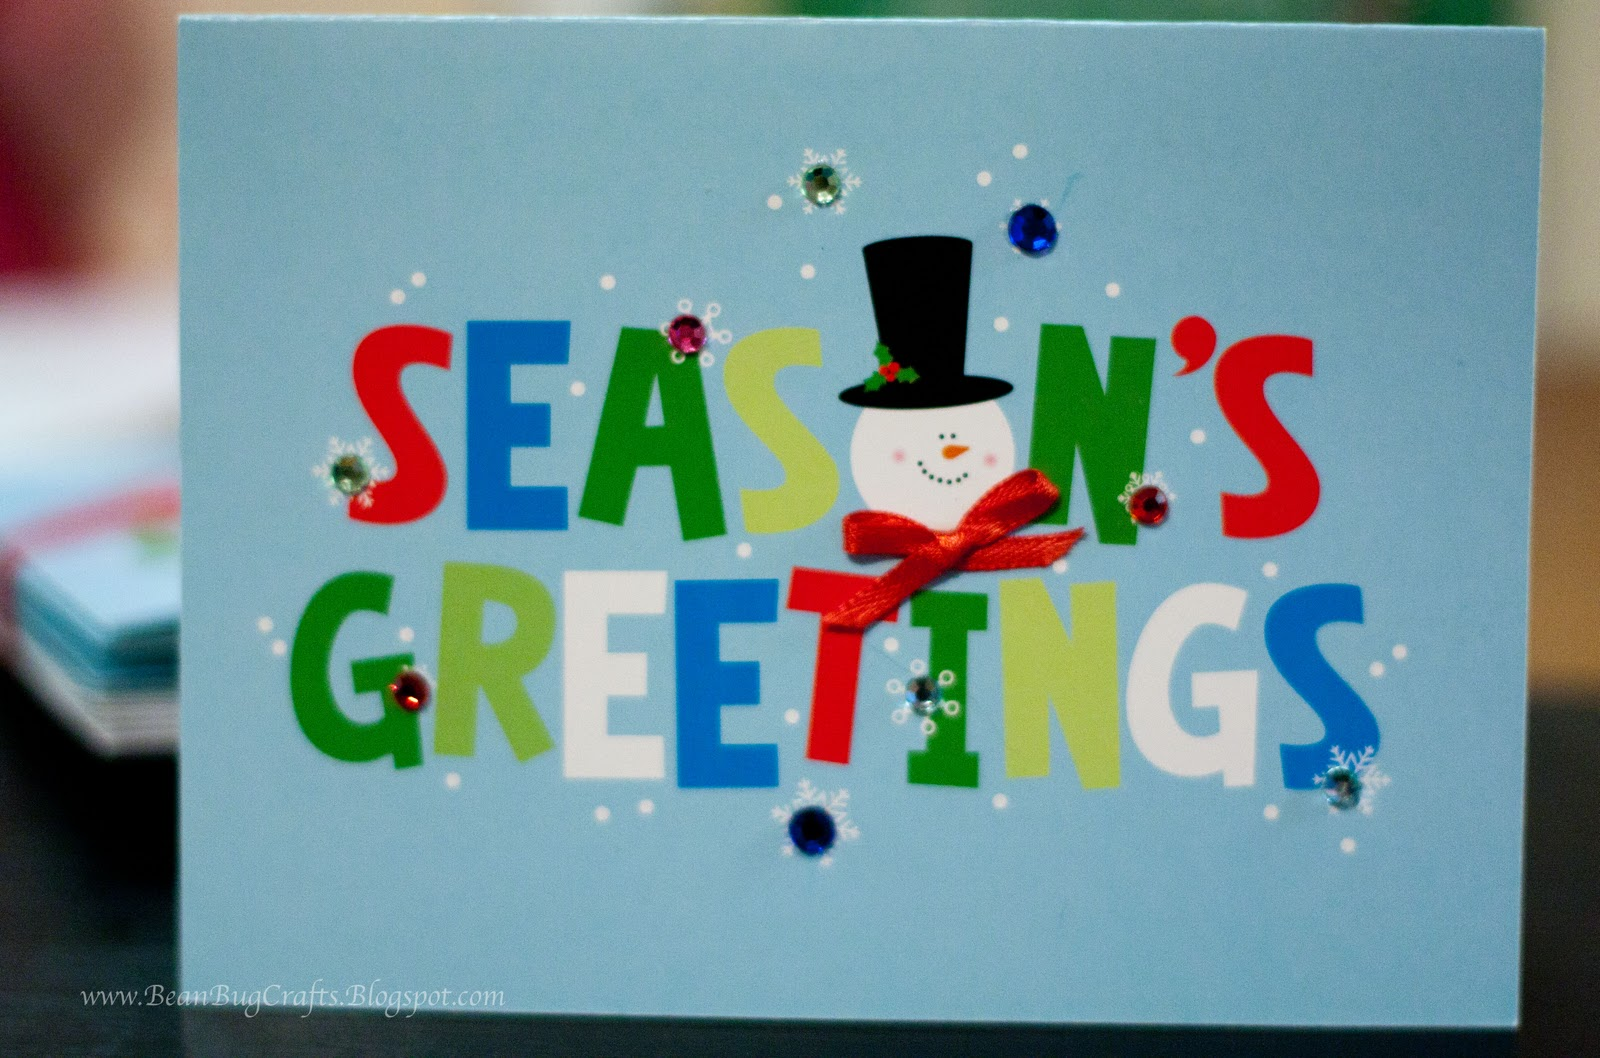 Beanbugcrafts Christmas Tutorial Semi Homemade